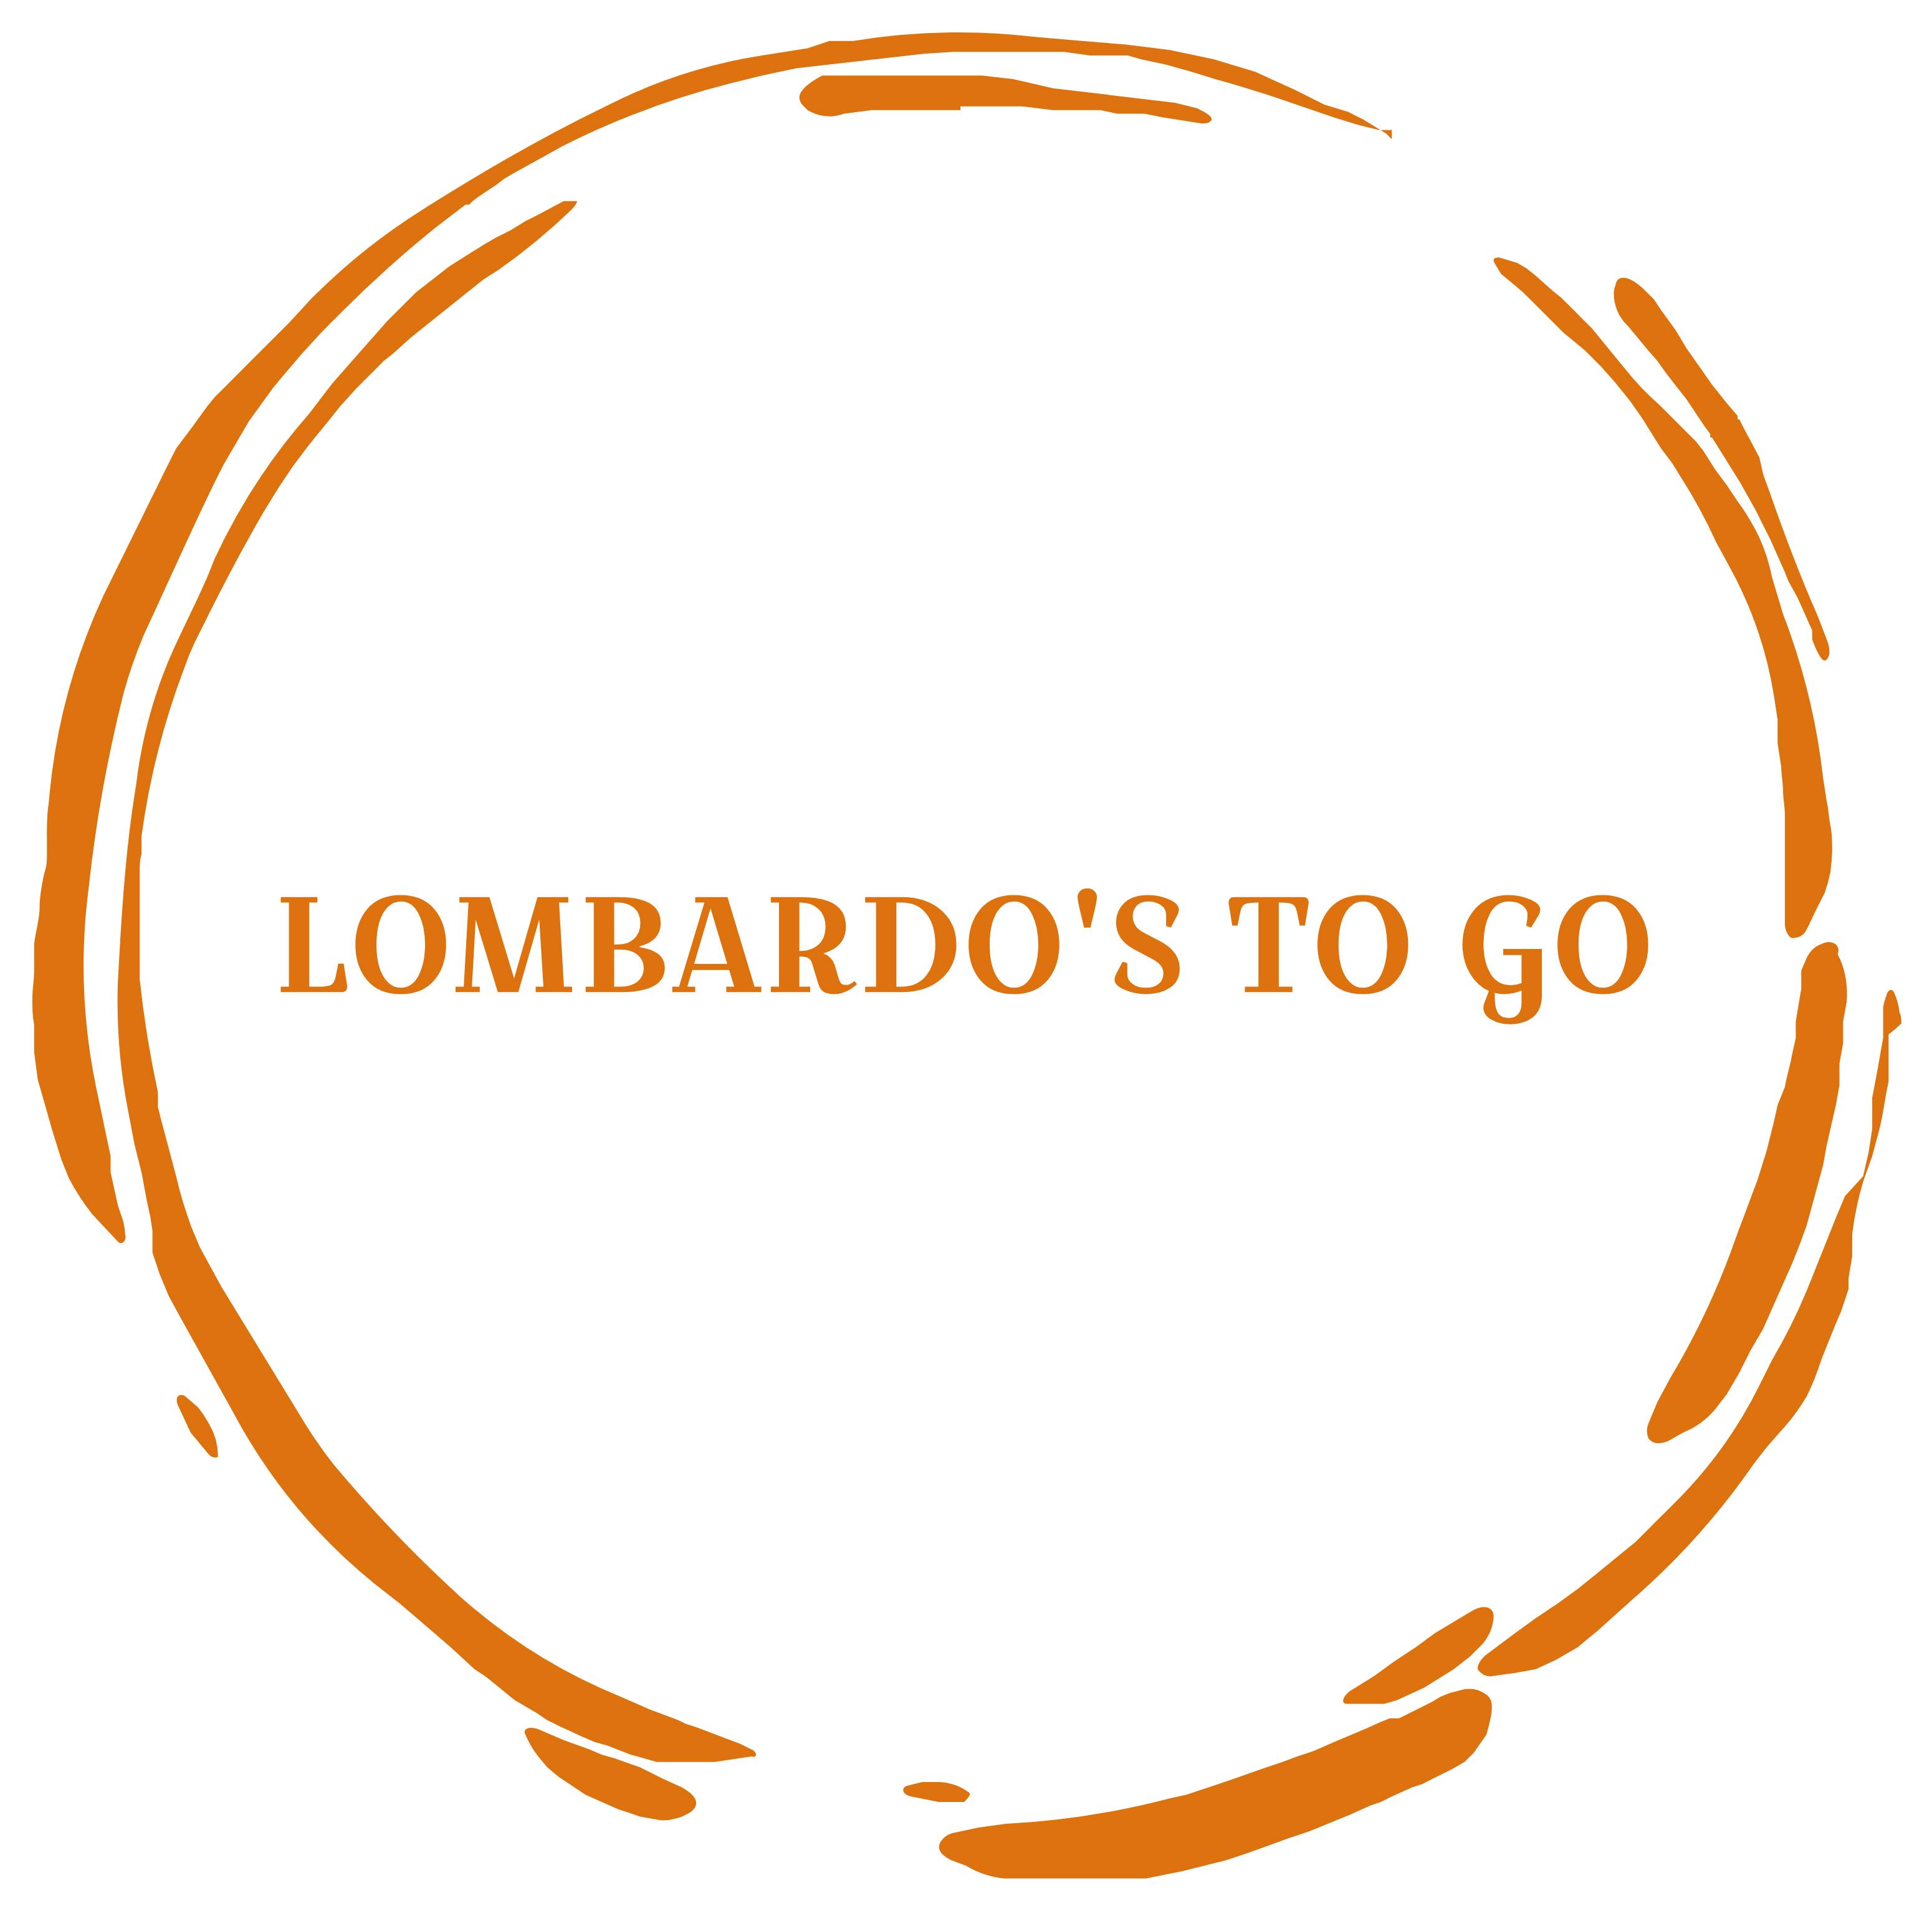 Lombardos_logo